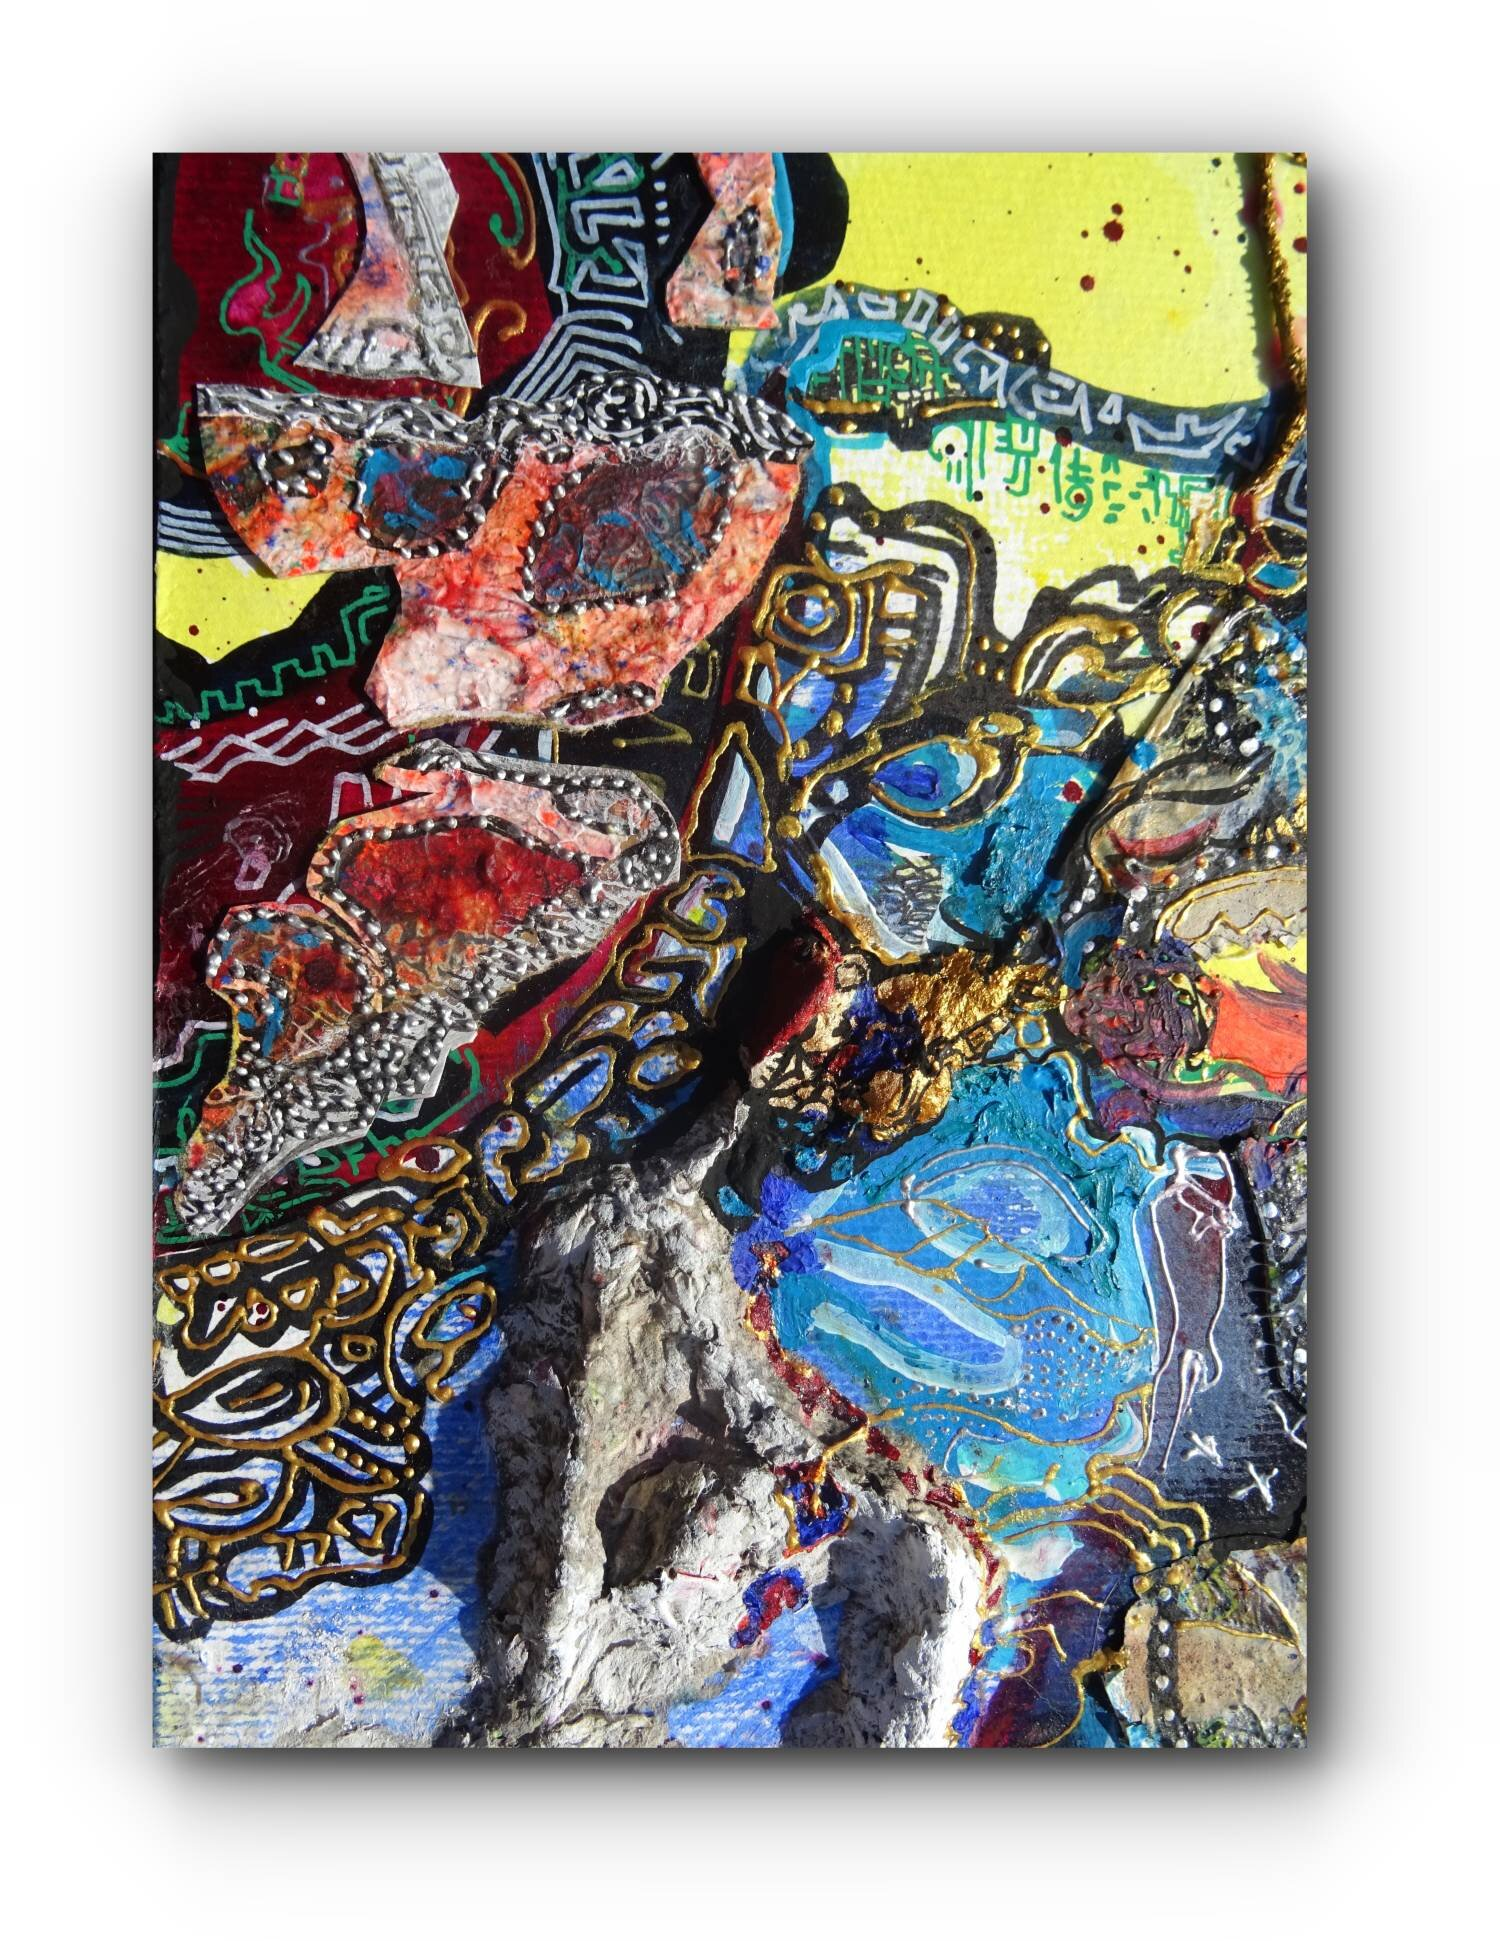 painting-celestial-summit-d2-artist-duo-ingress-vortices.jpg